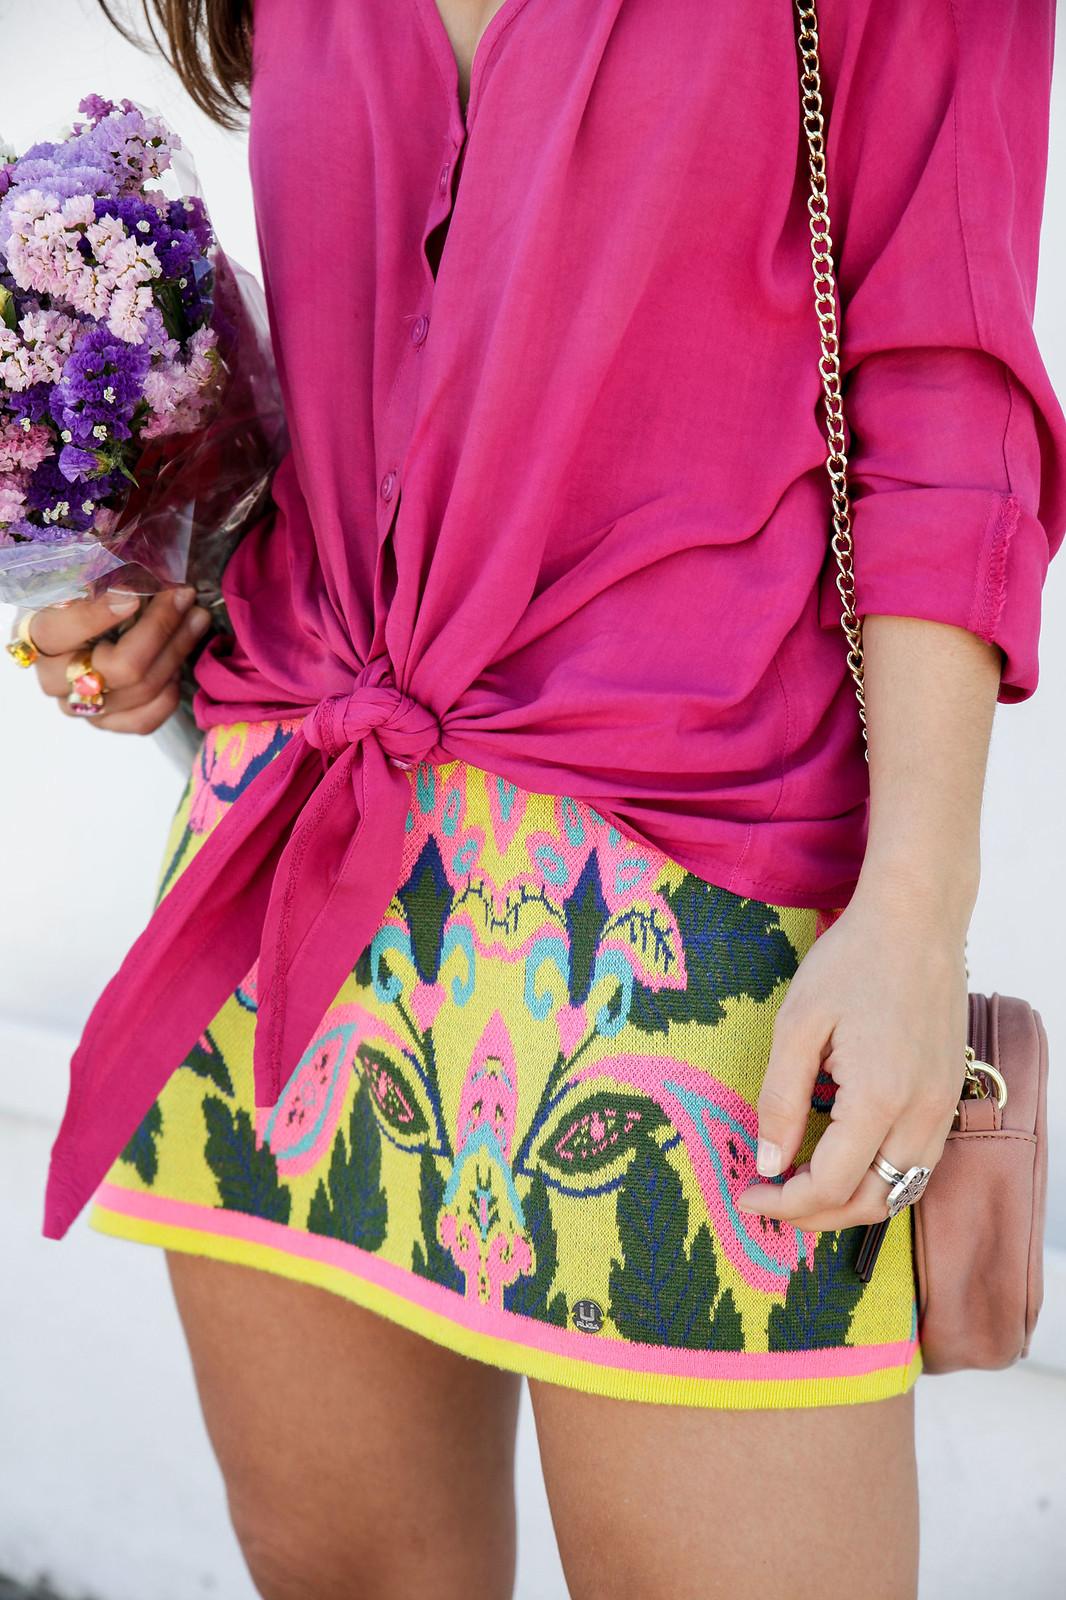 016_blusa_magenta_falda_amarilla_outfit_ruga_summer17_theguestgirl_influencer_barcelona_portugal_brand_ambassador